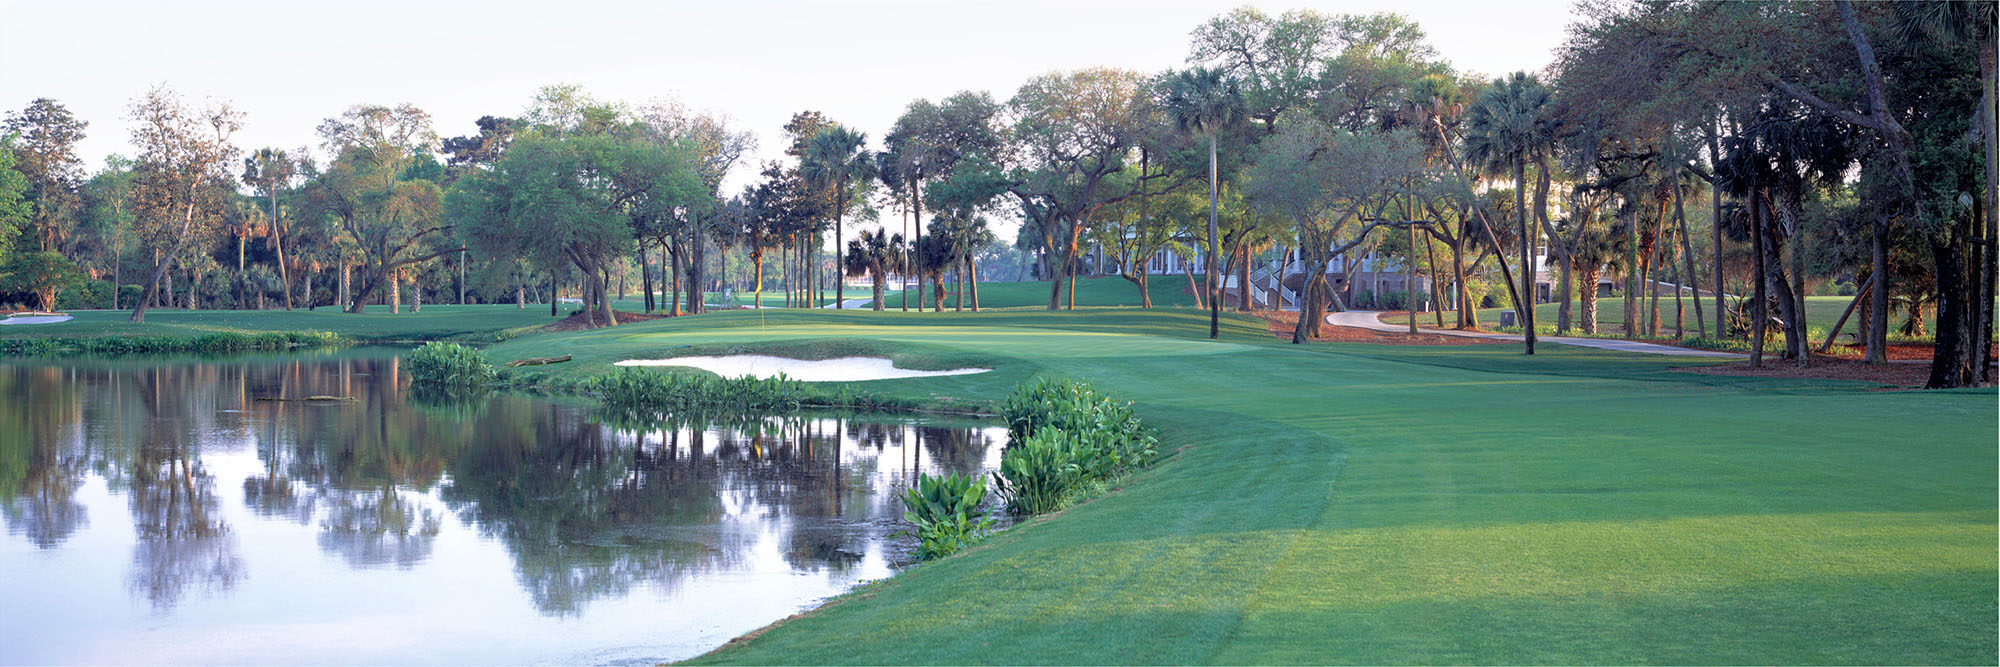 Golf Course Image - Kiawah Turtle Point No. 9